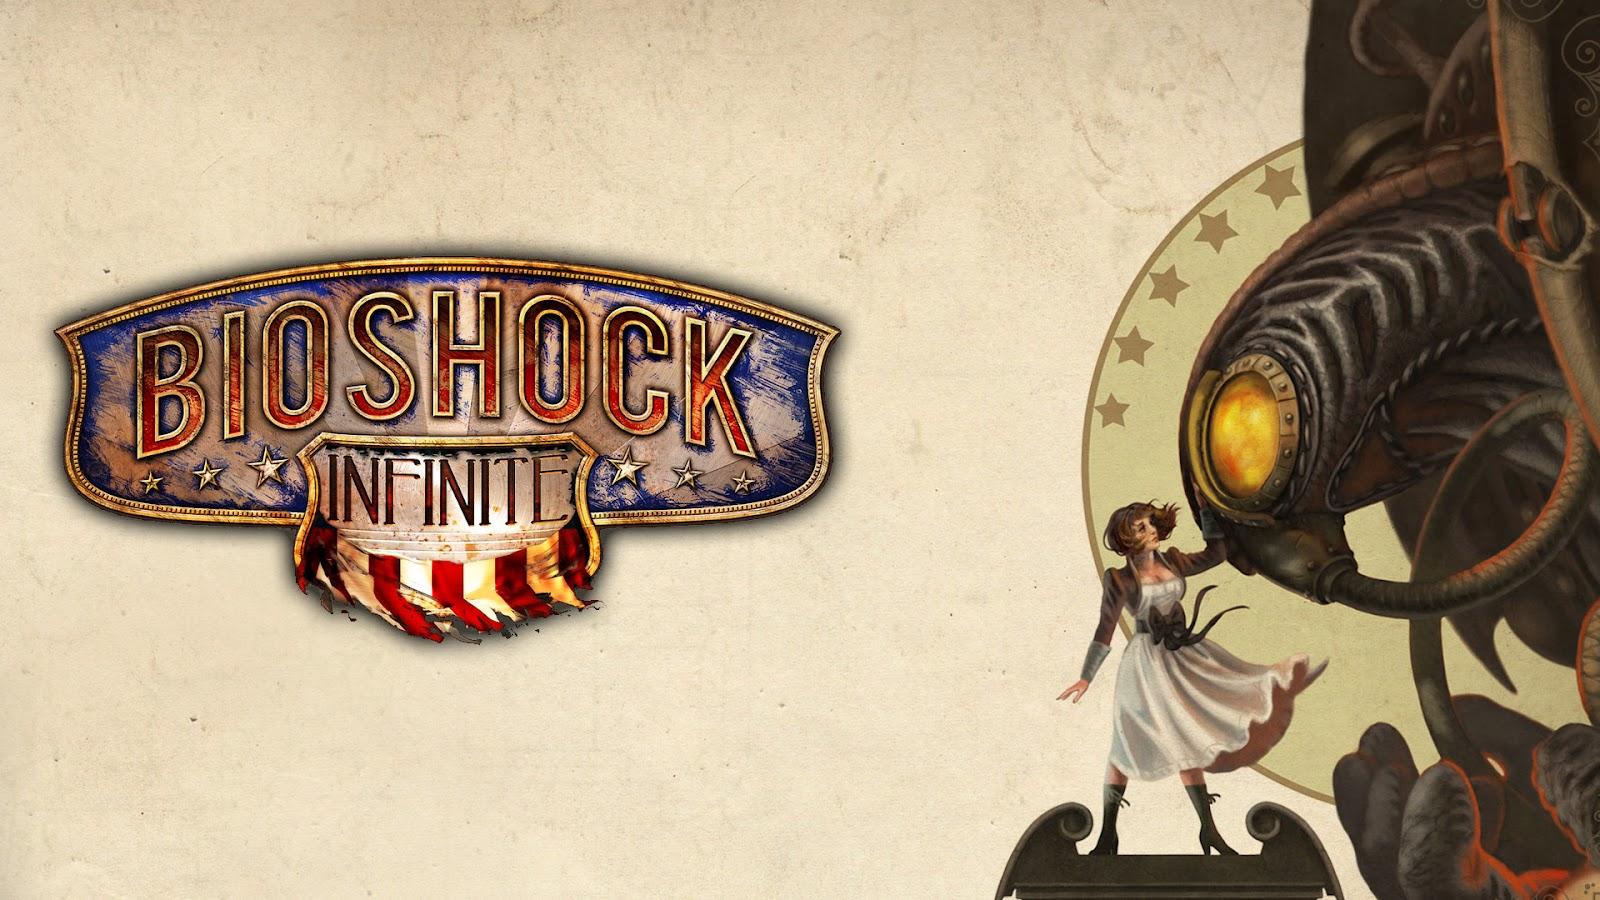 http://1.bp.blogspot.com/-IMd6yYHylBY/UBdNQIM5bLI/AAAAAAAAIks/KhVtyYFKh4Y/s1600/bioshock-infinite-wallpaper-hd-2.jpg